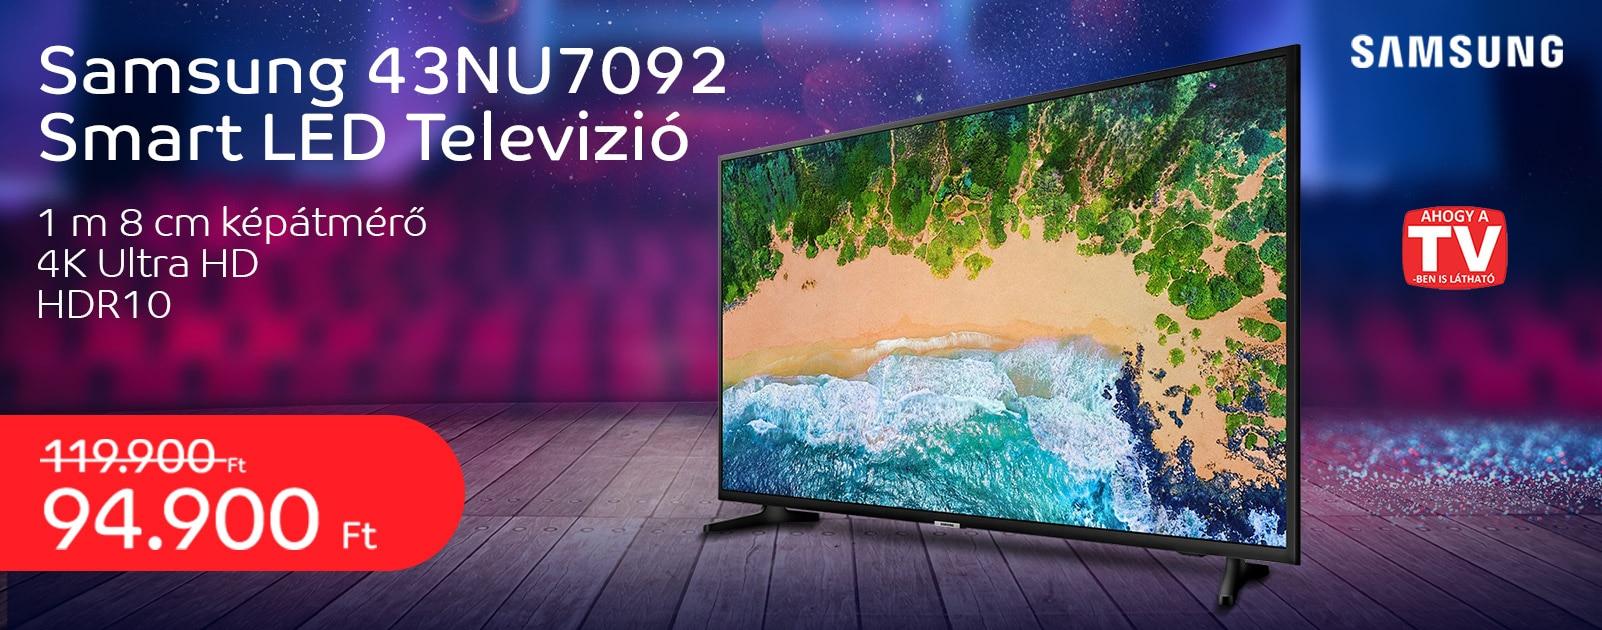 Samsung UE43NU7092UXXH Smart LED Televízió